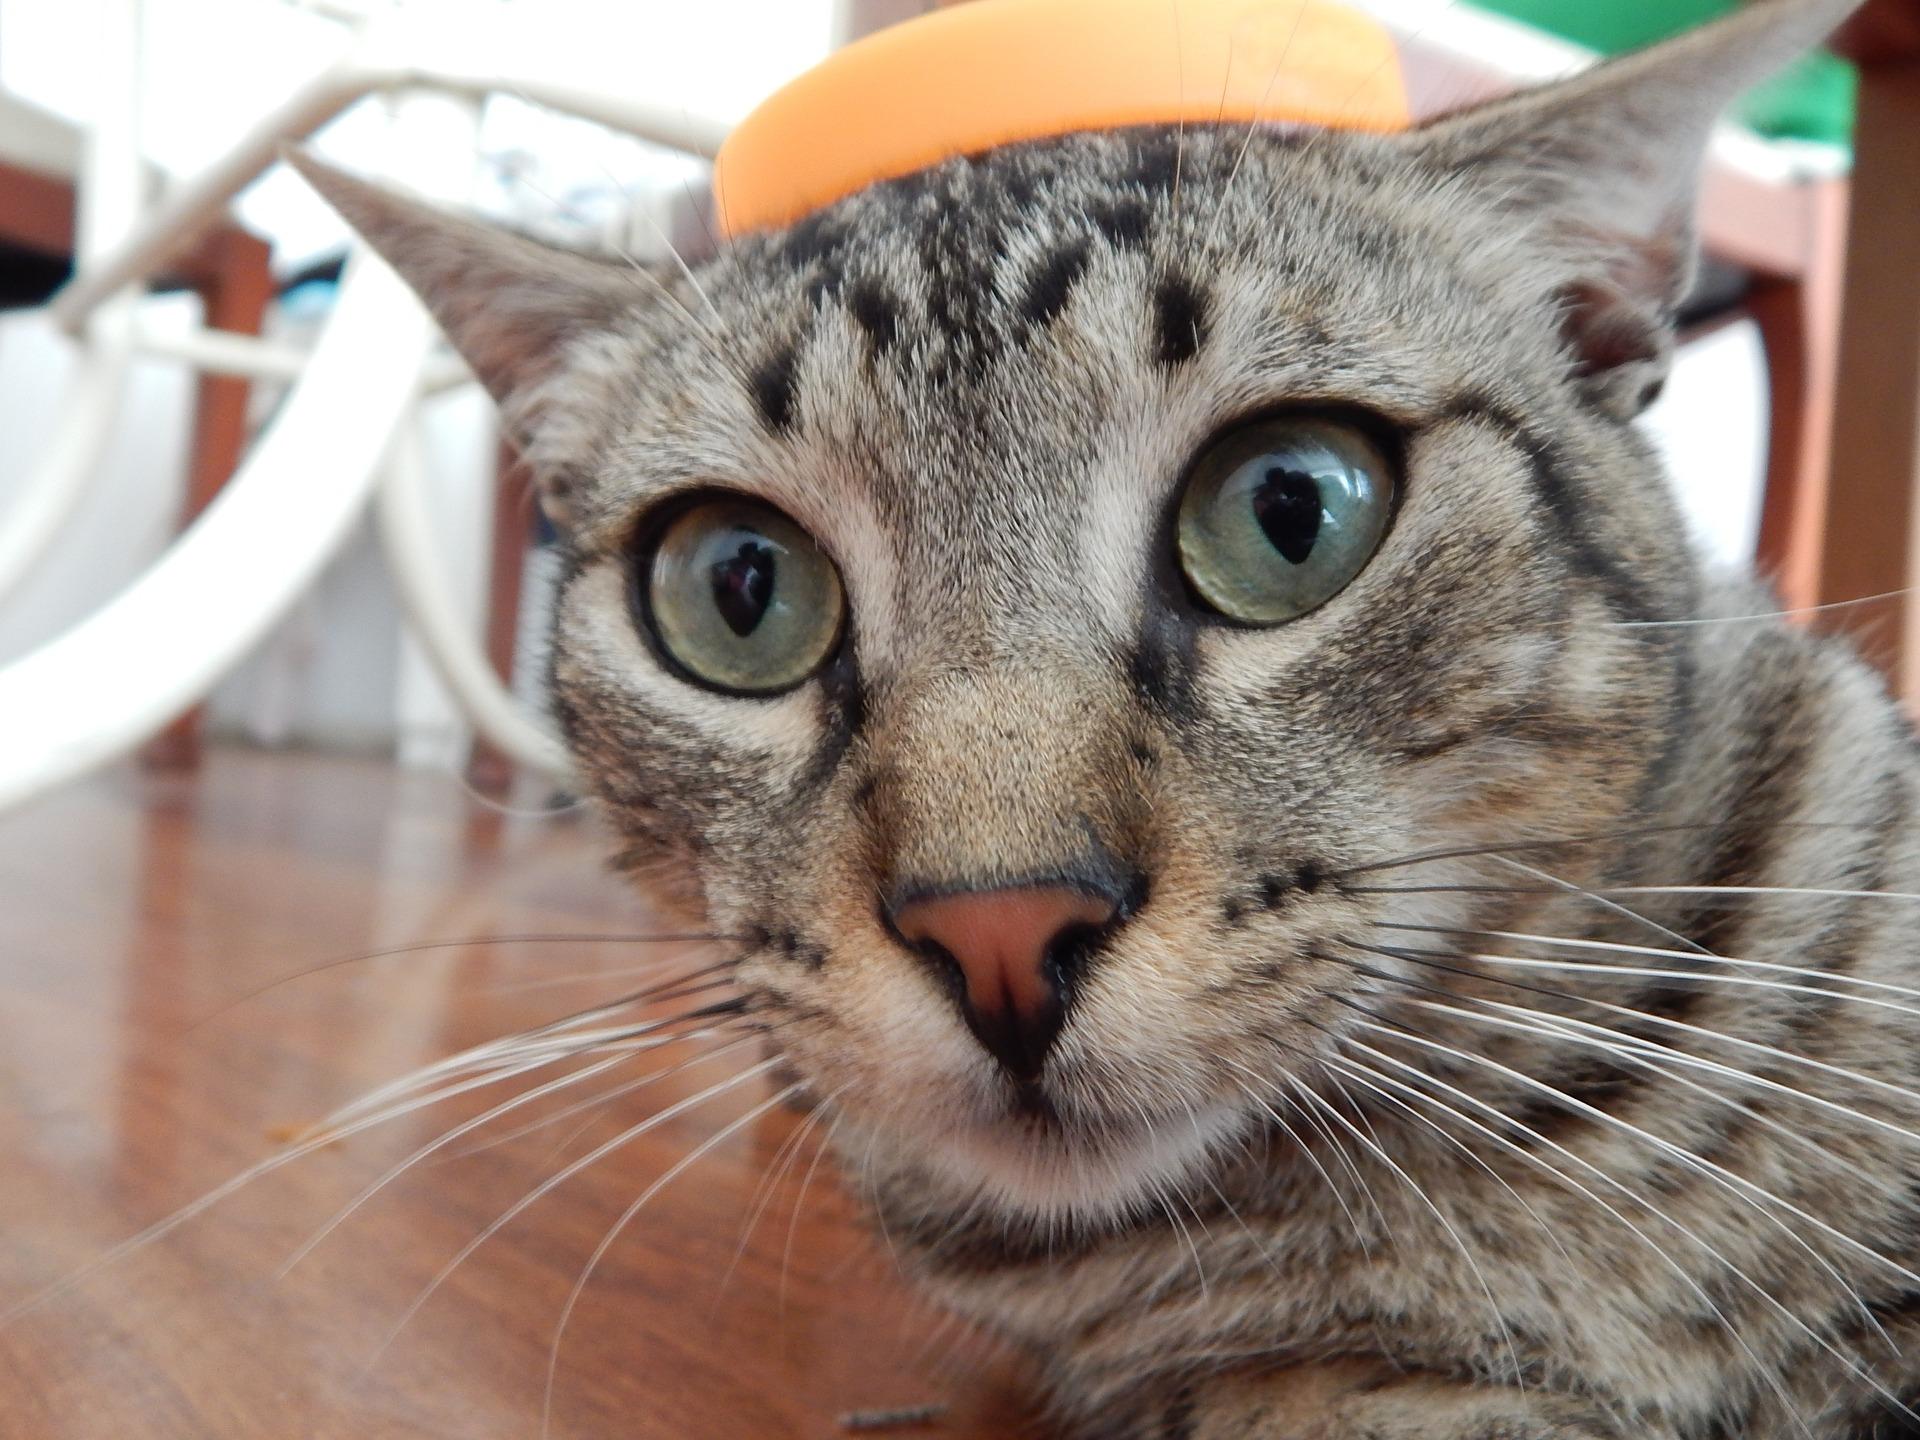 cat-633081_1920.jpg